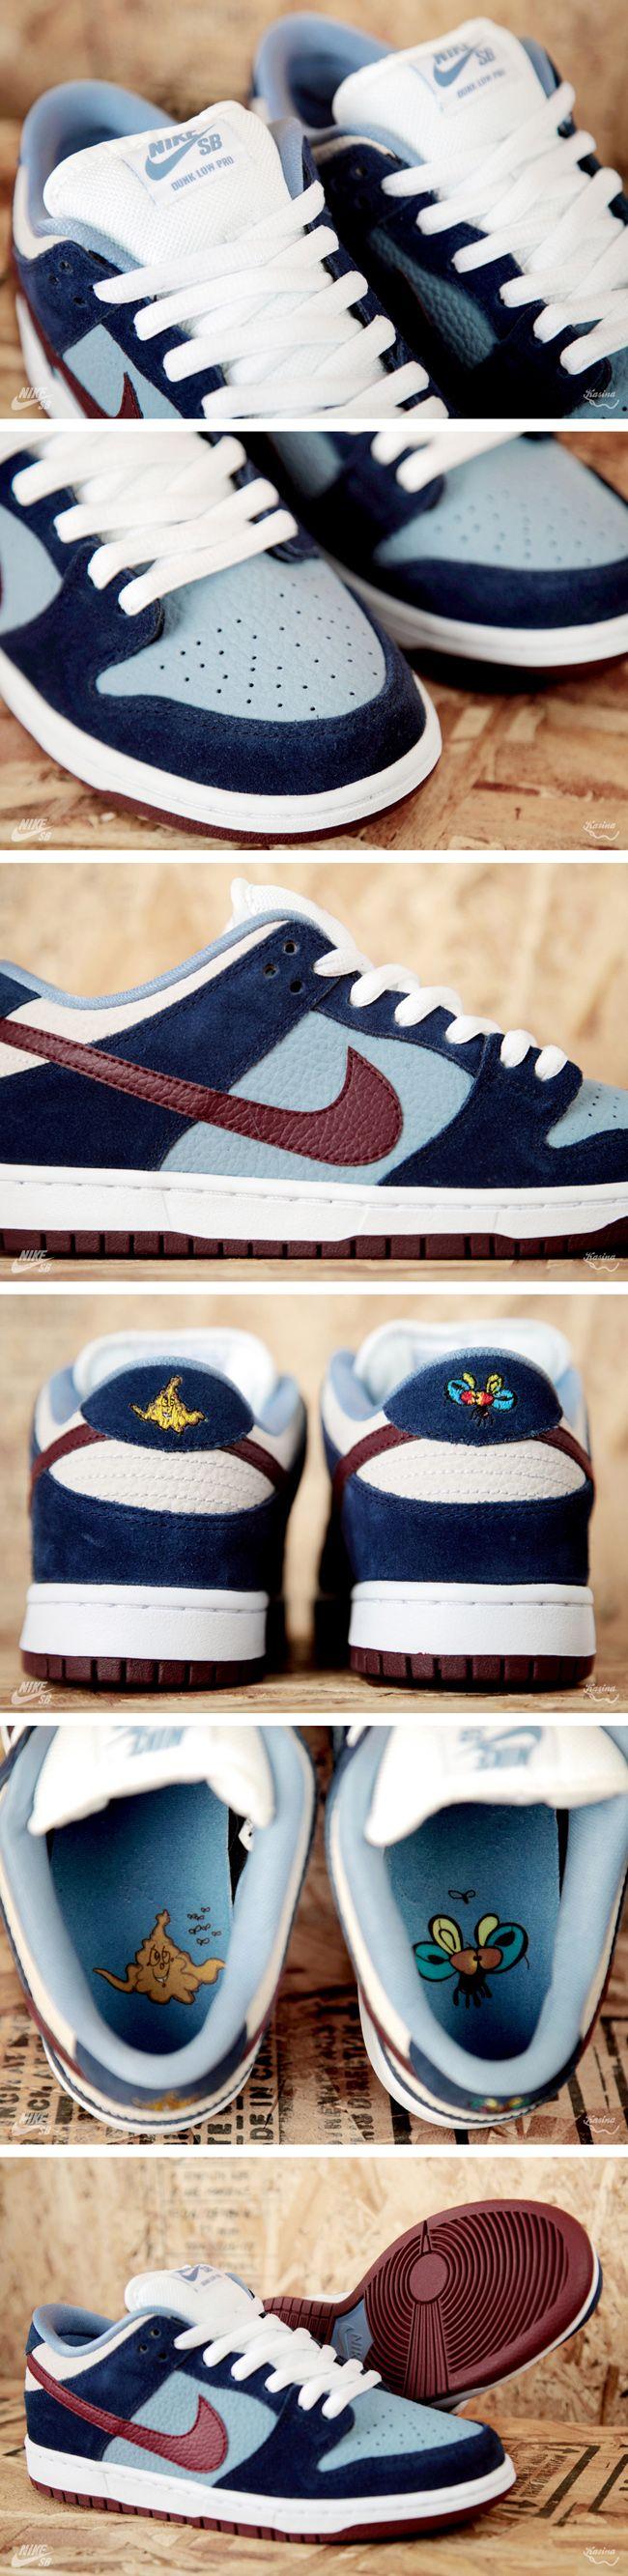 "Detailed Photos: FTC x Nike SB Dunk Low Pro ""Finally"""